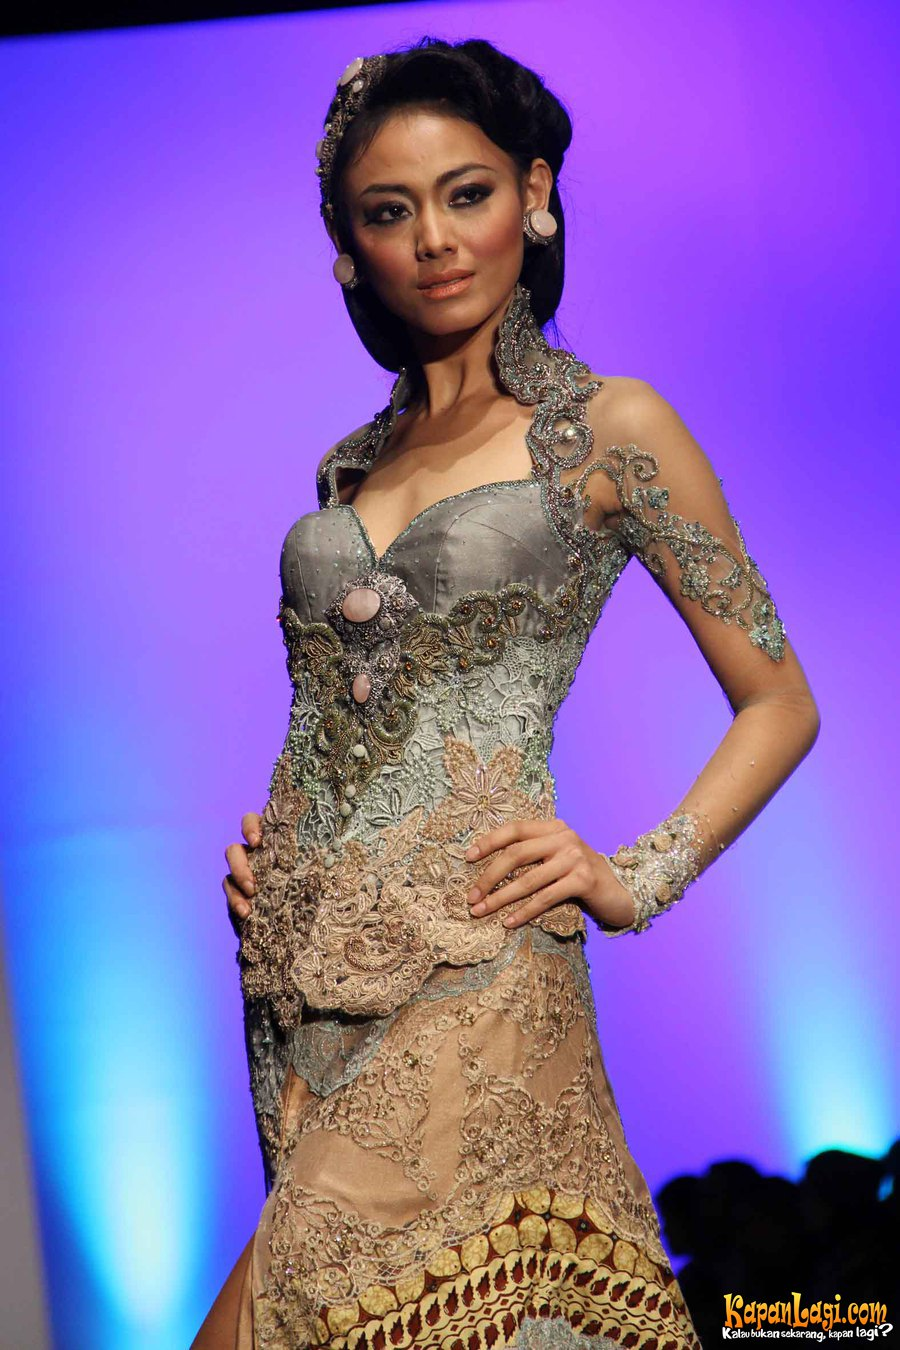 Pin Kebaya Modern Fashion 2008 Indonesia Pelautscom on Pinterest